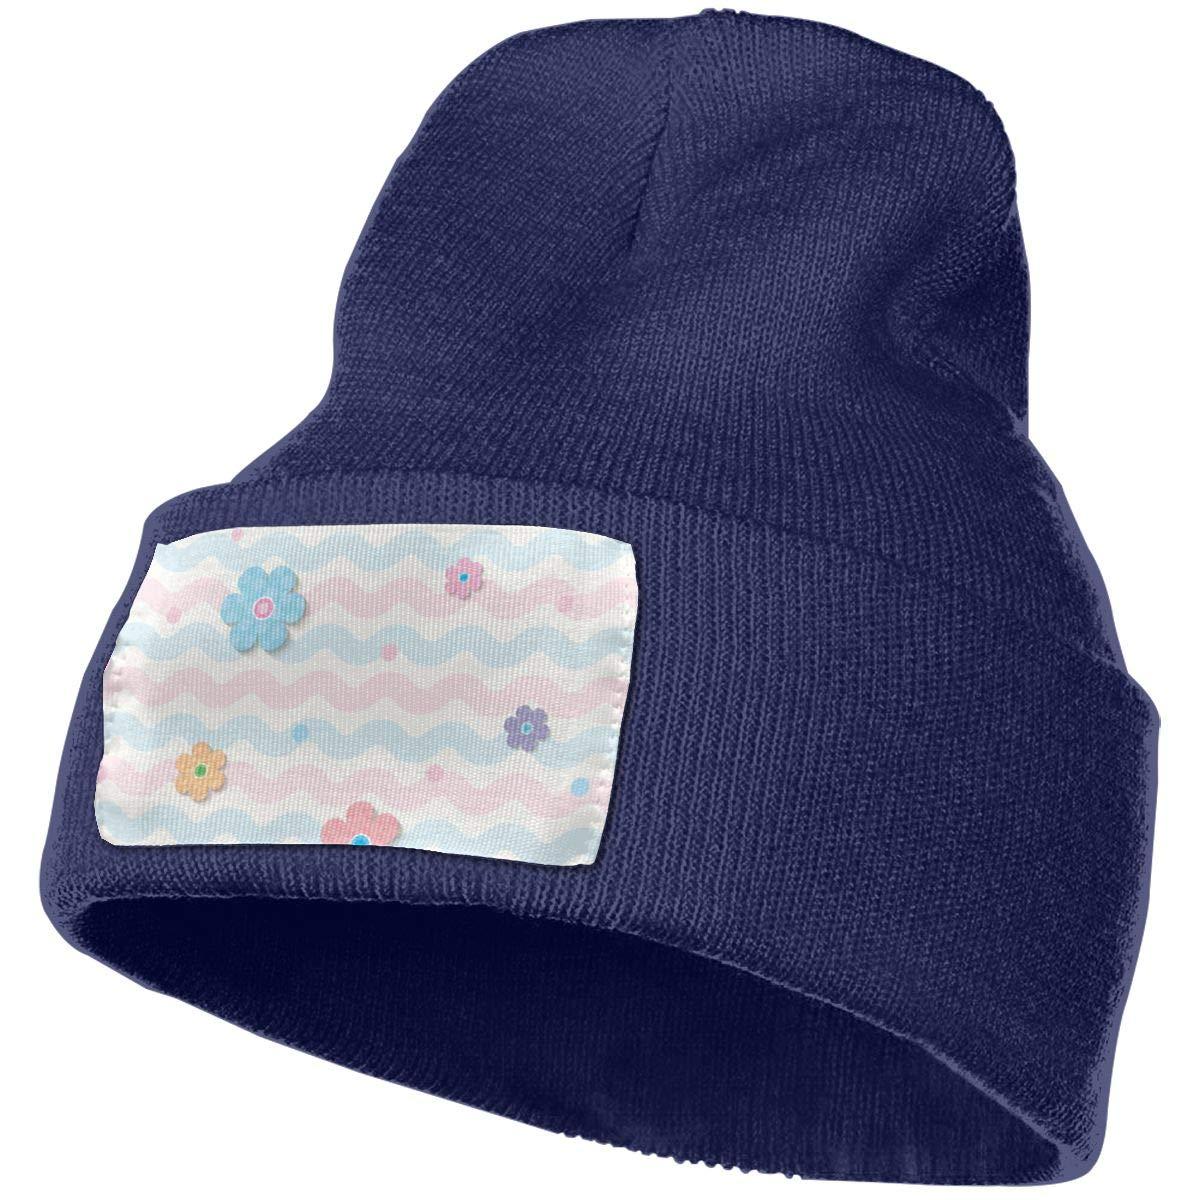 ONHIM Spring-Flower Unisex Winter Warm Knit Beanie Hat Slouchy Serious Style Beanie